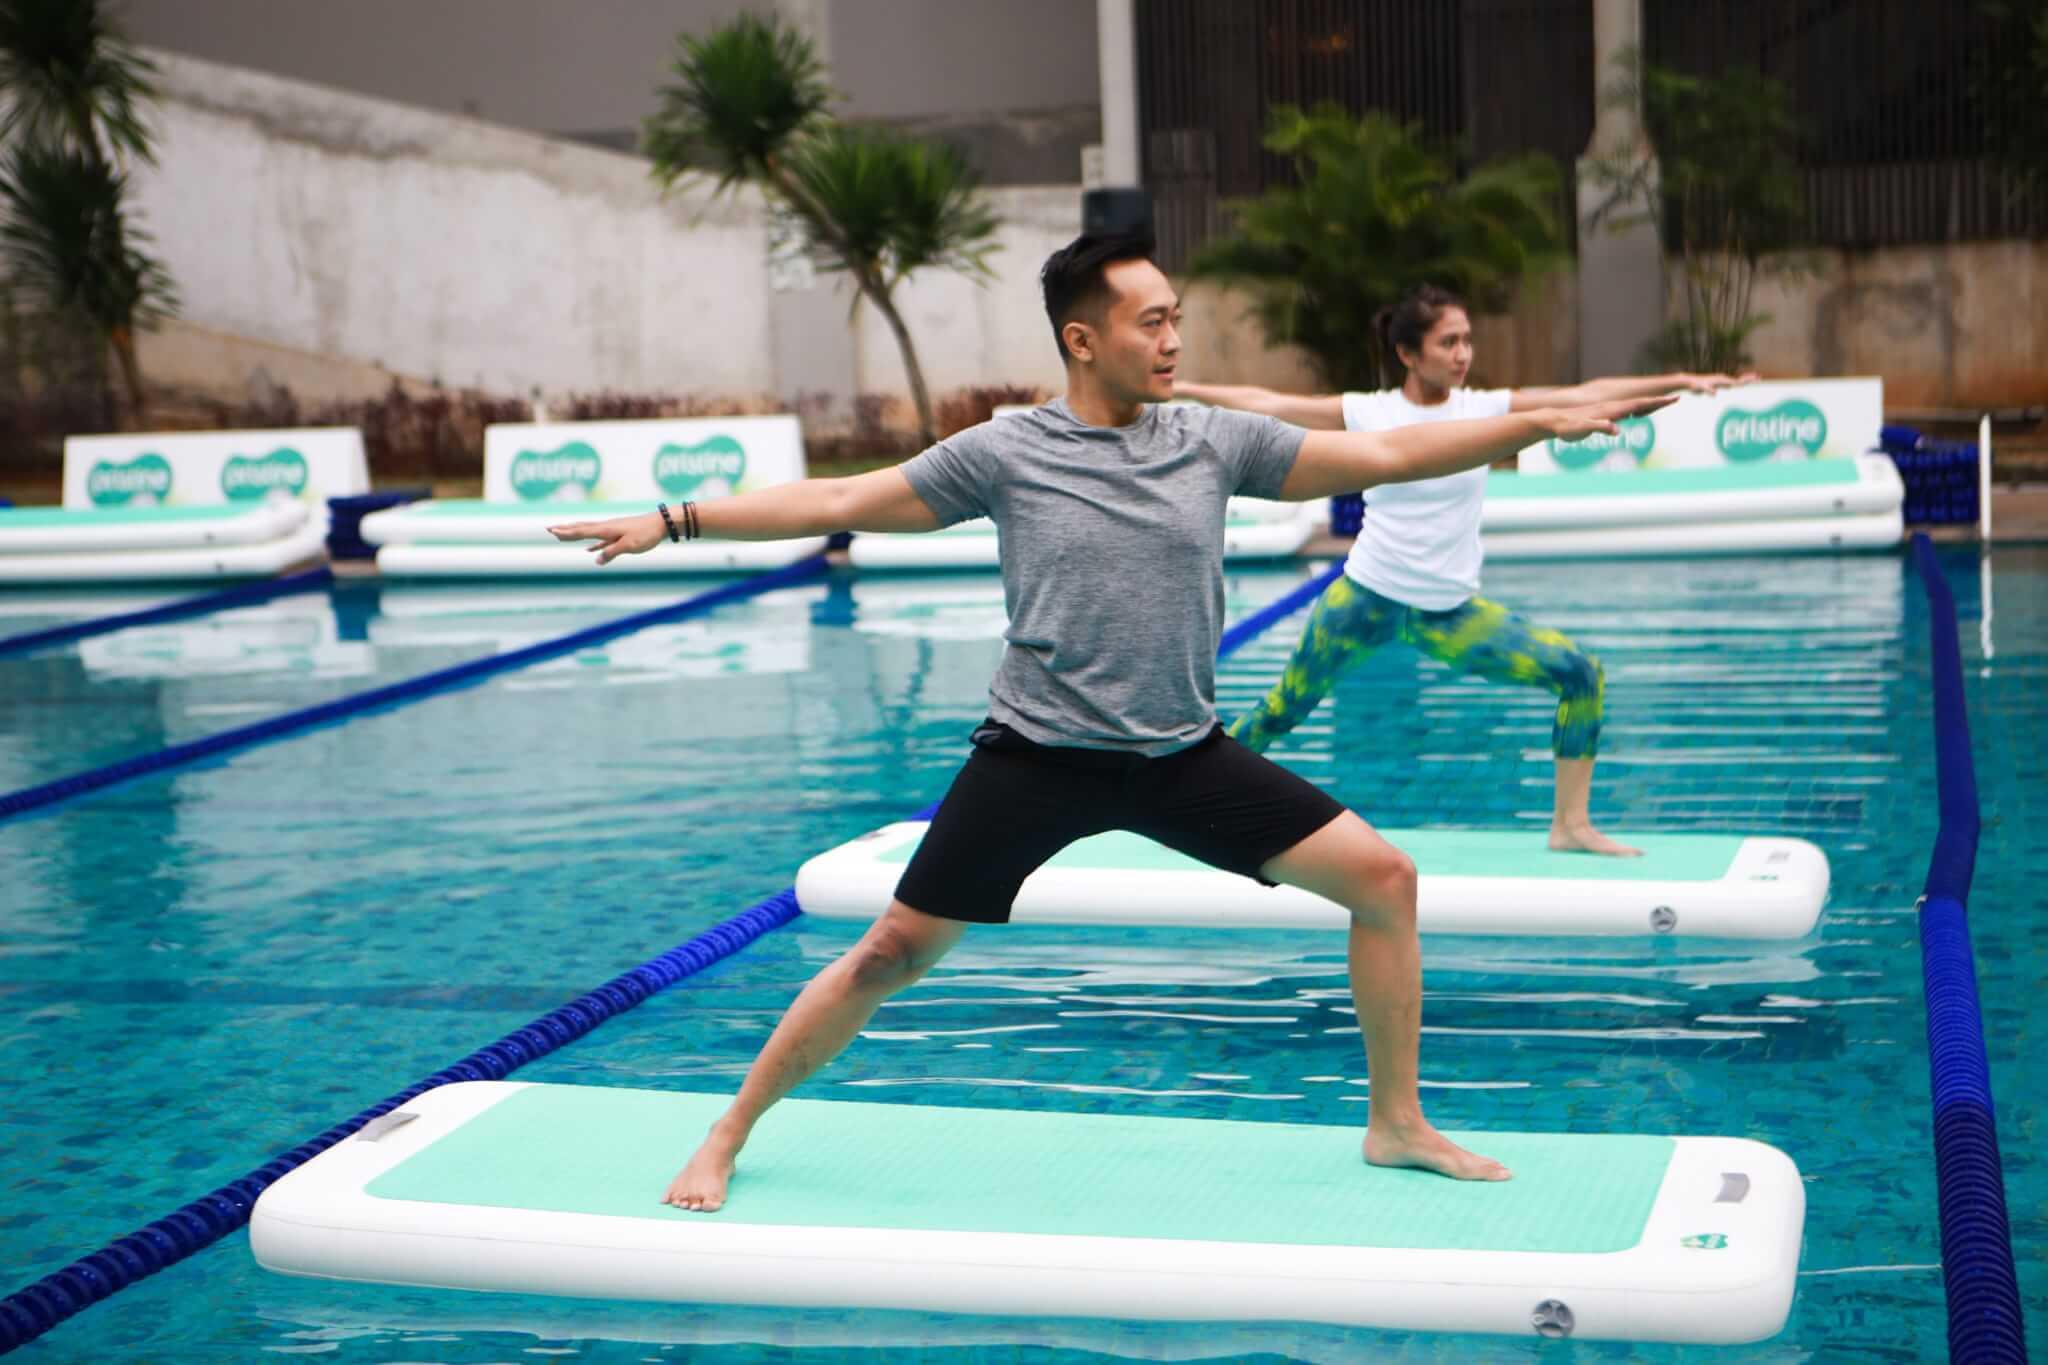 Yoga, Floating Yoga, Kesehatan, Olahraga, Pristine 8+